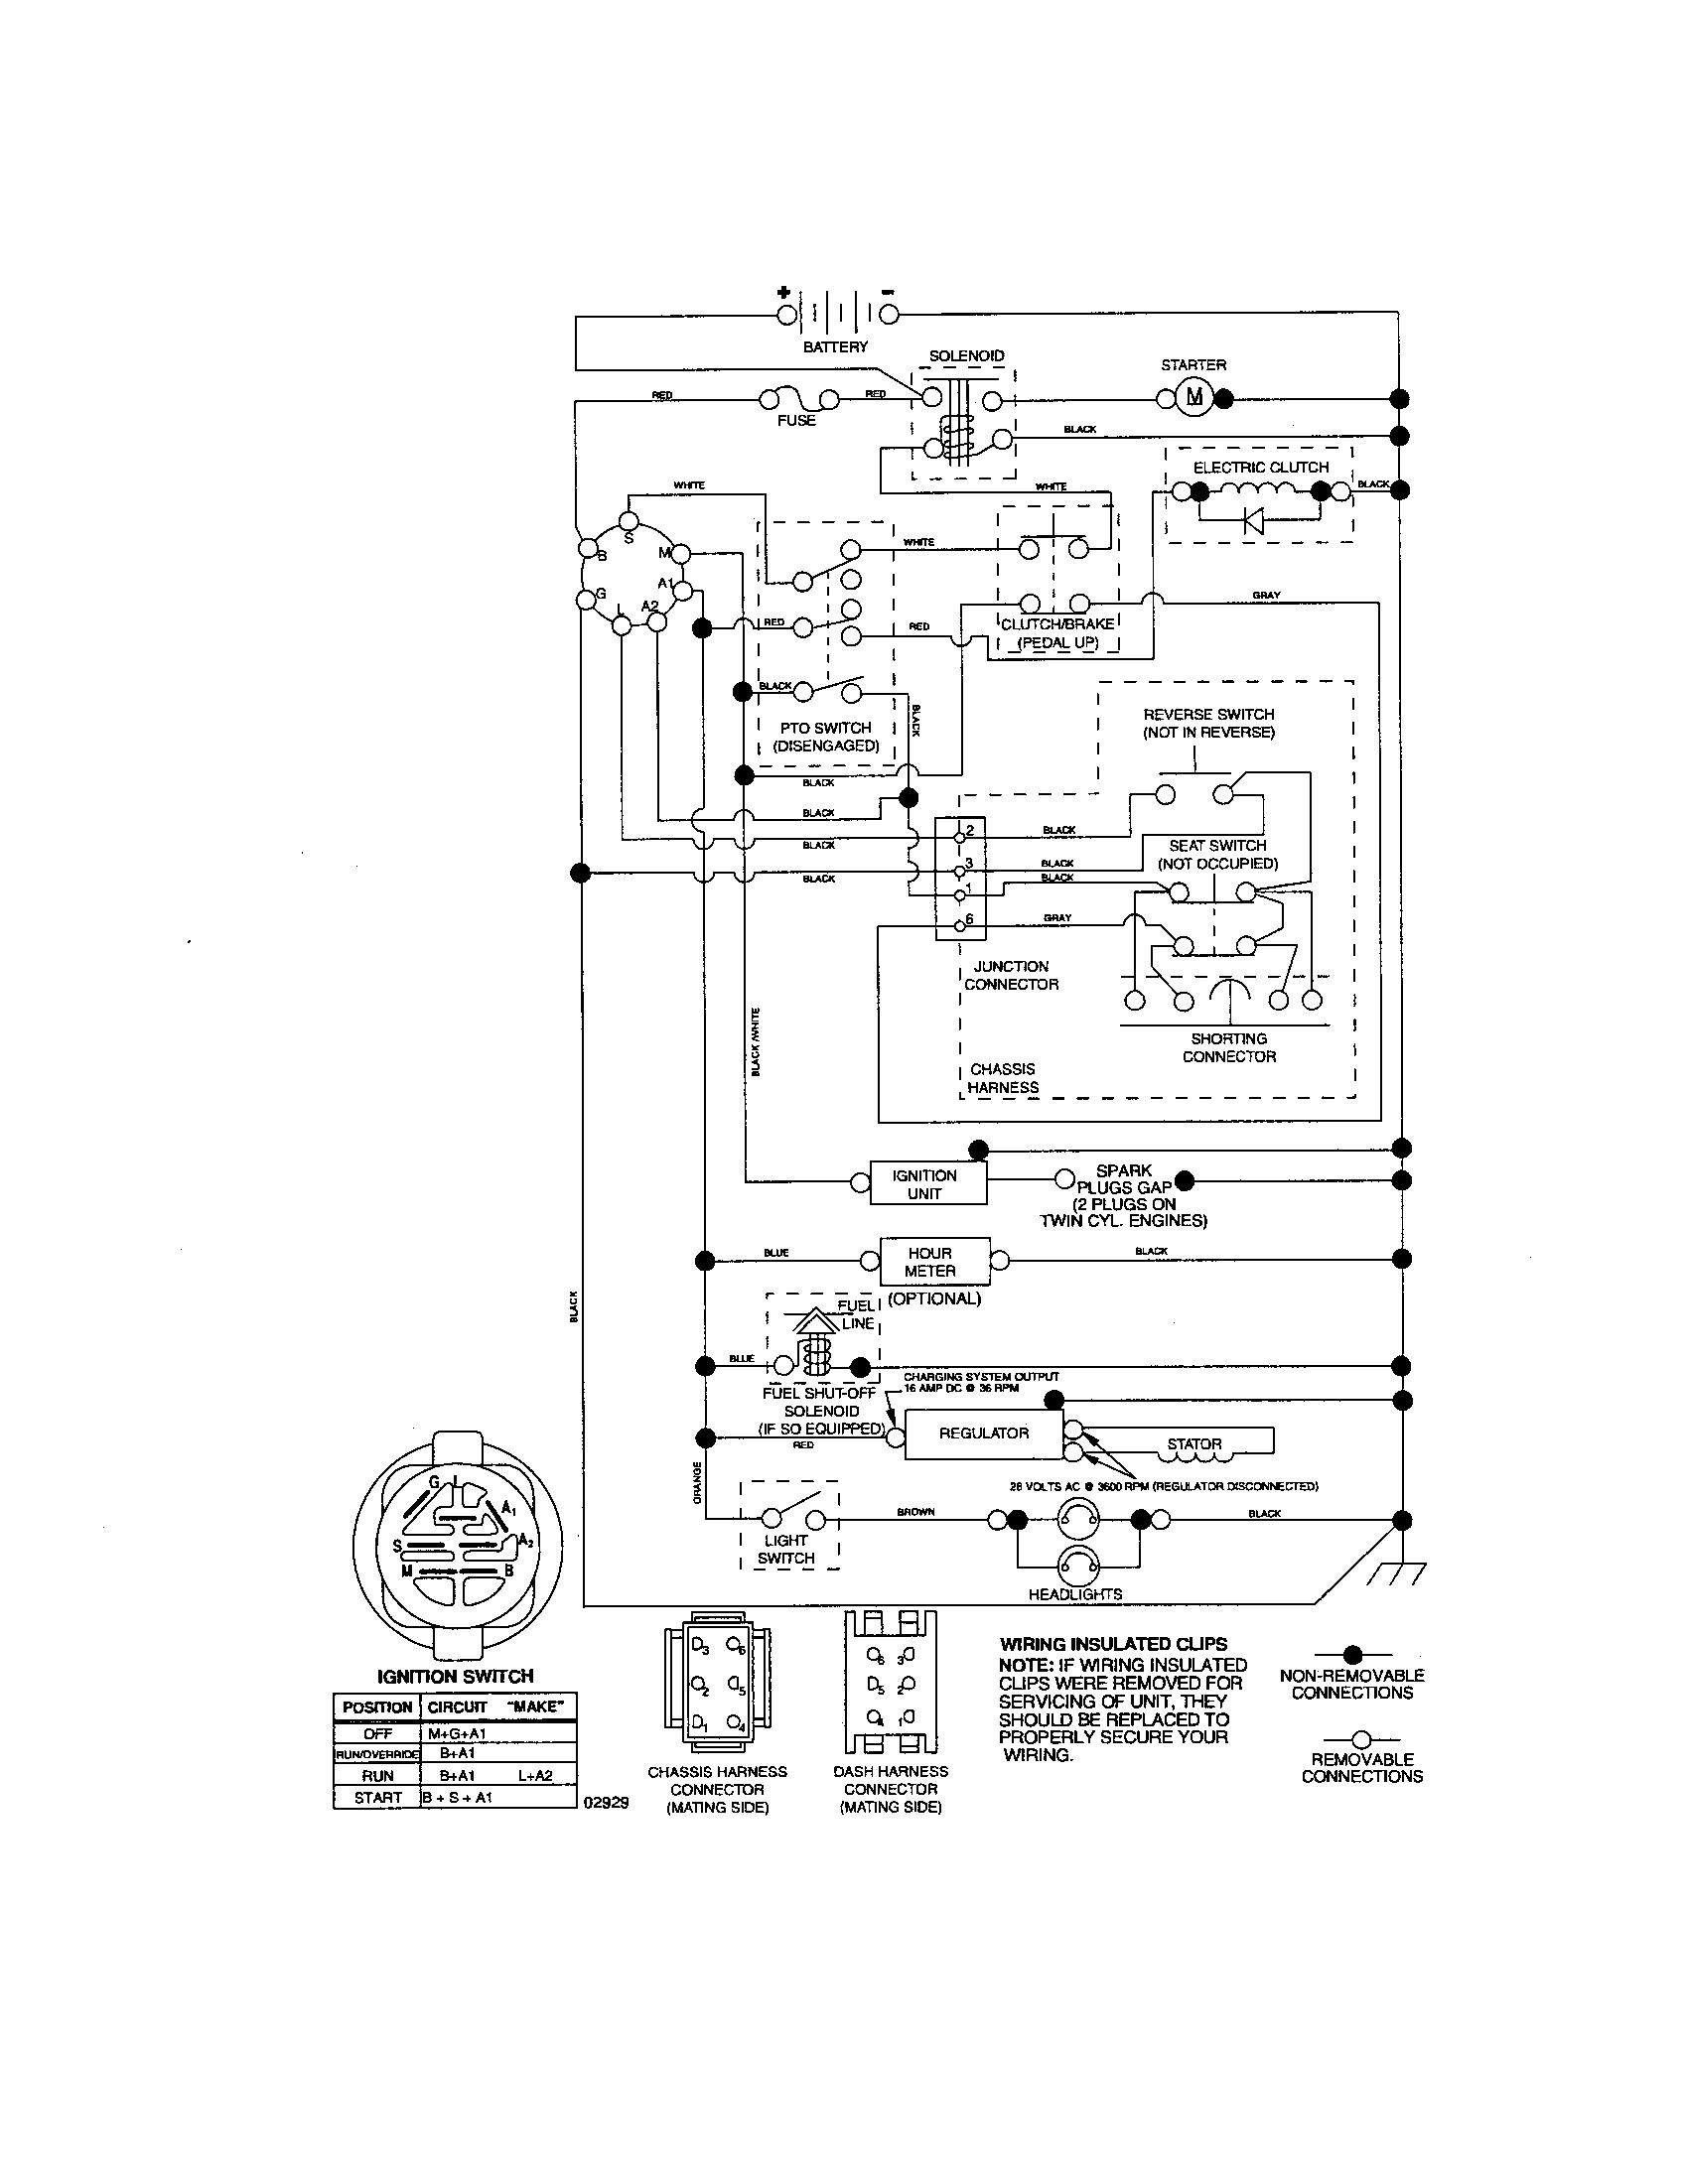 husqvarna lawn tractor wiring diagram towing socket zero turn mower diagrams free